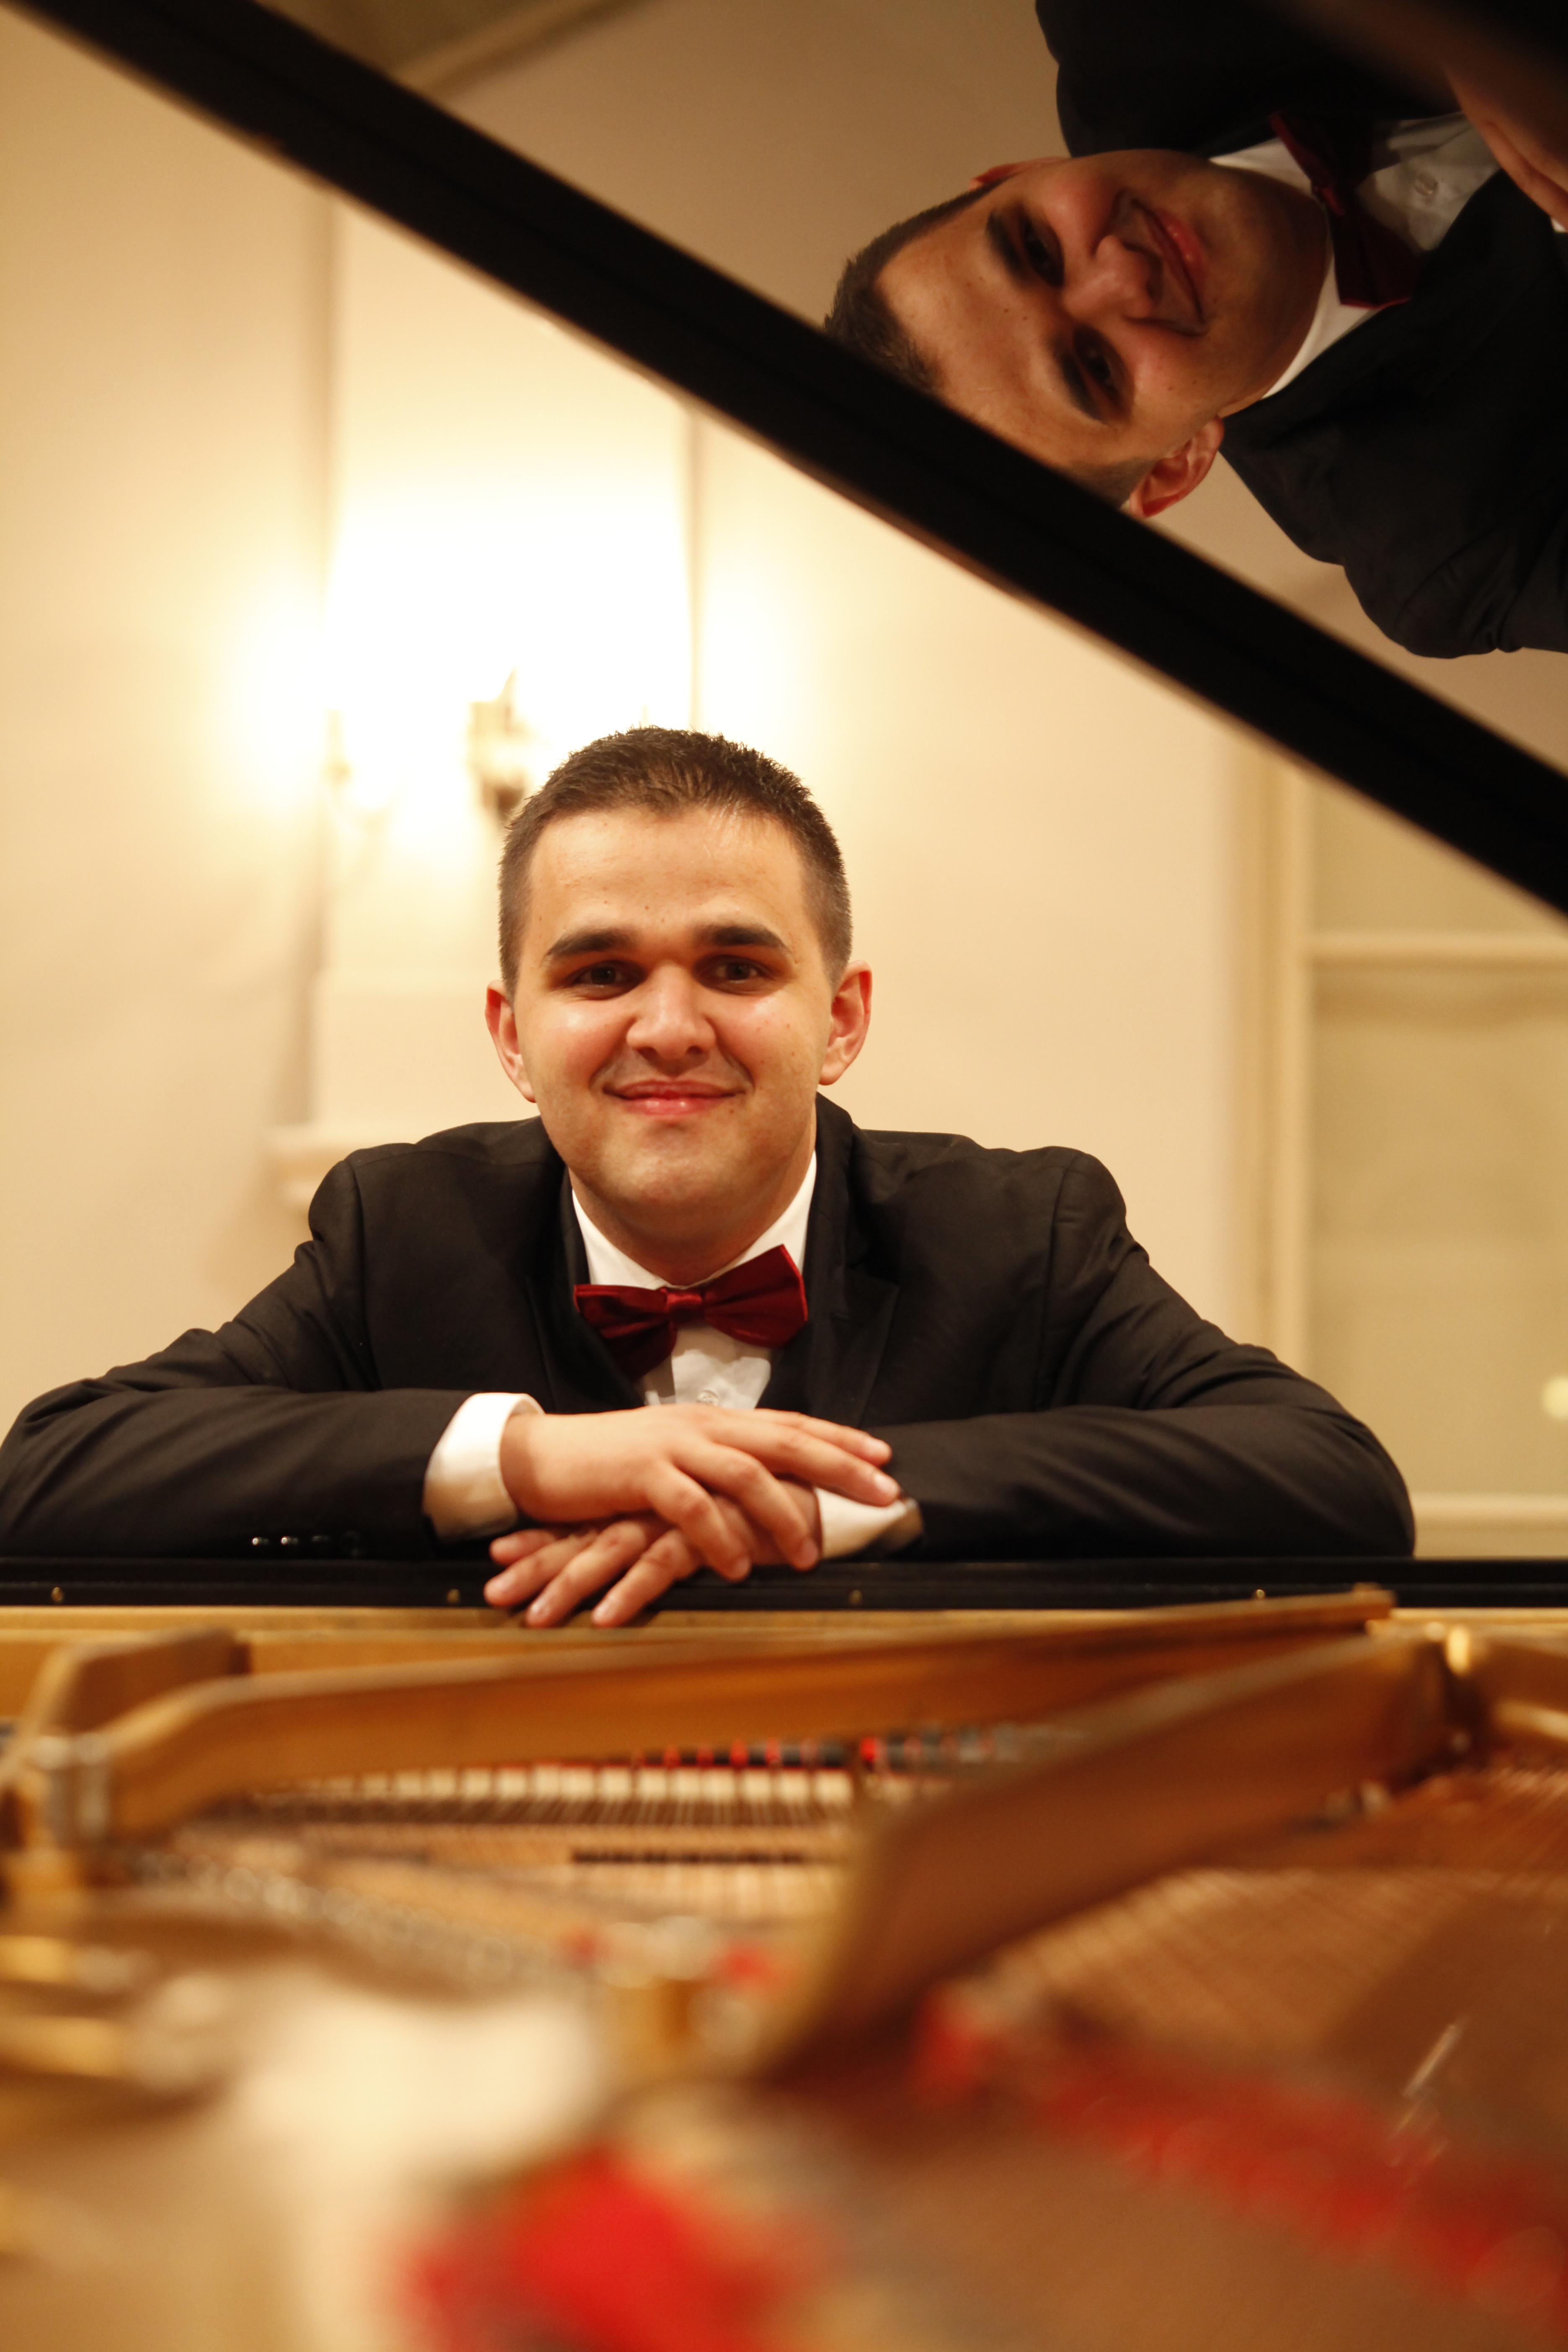 Koncert: Krešimir Starčević, klavir